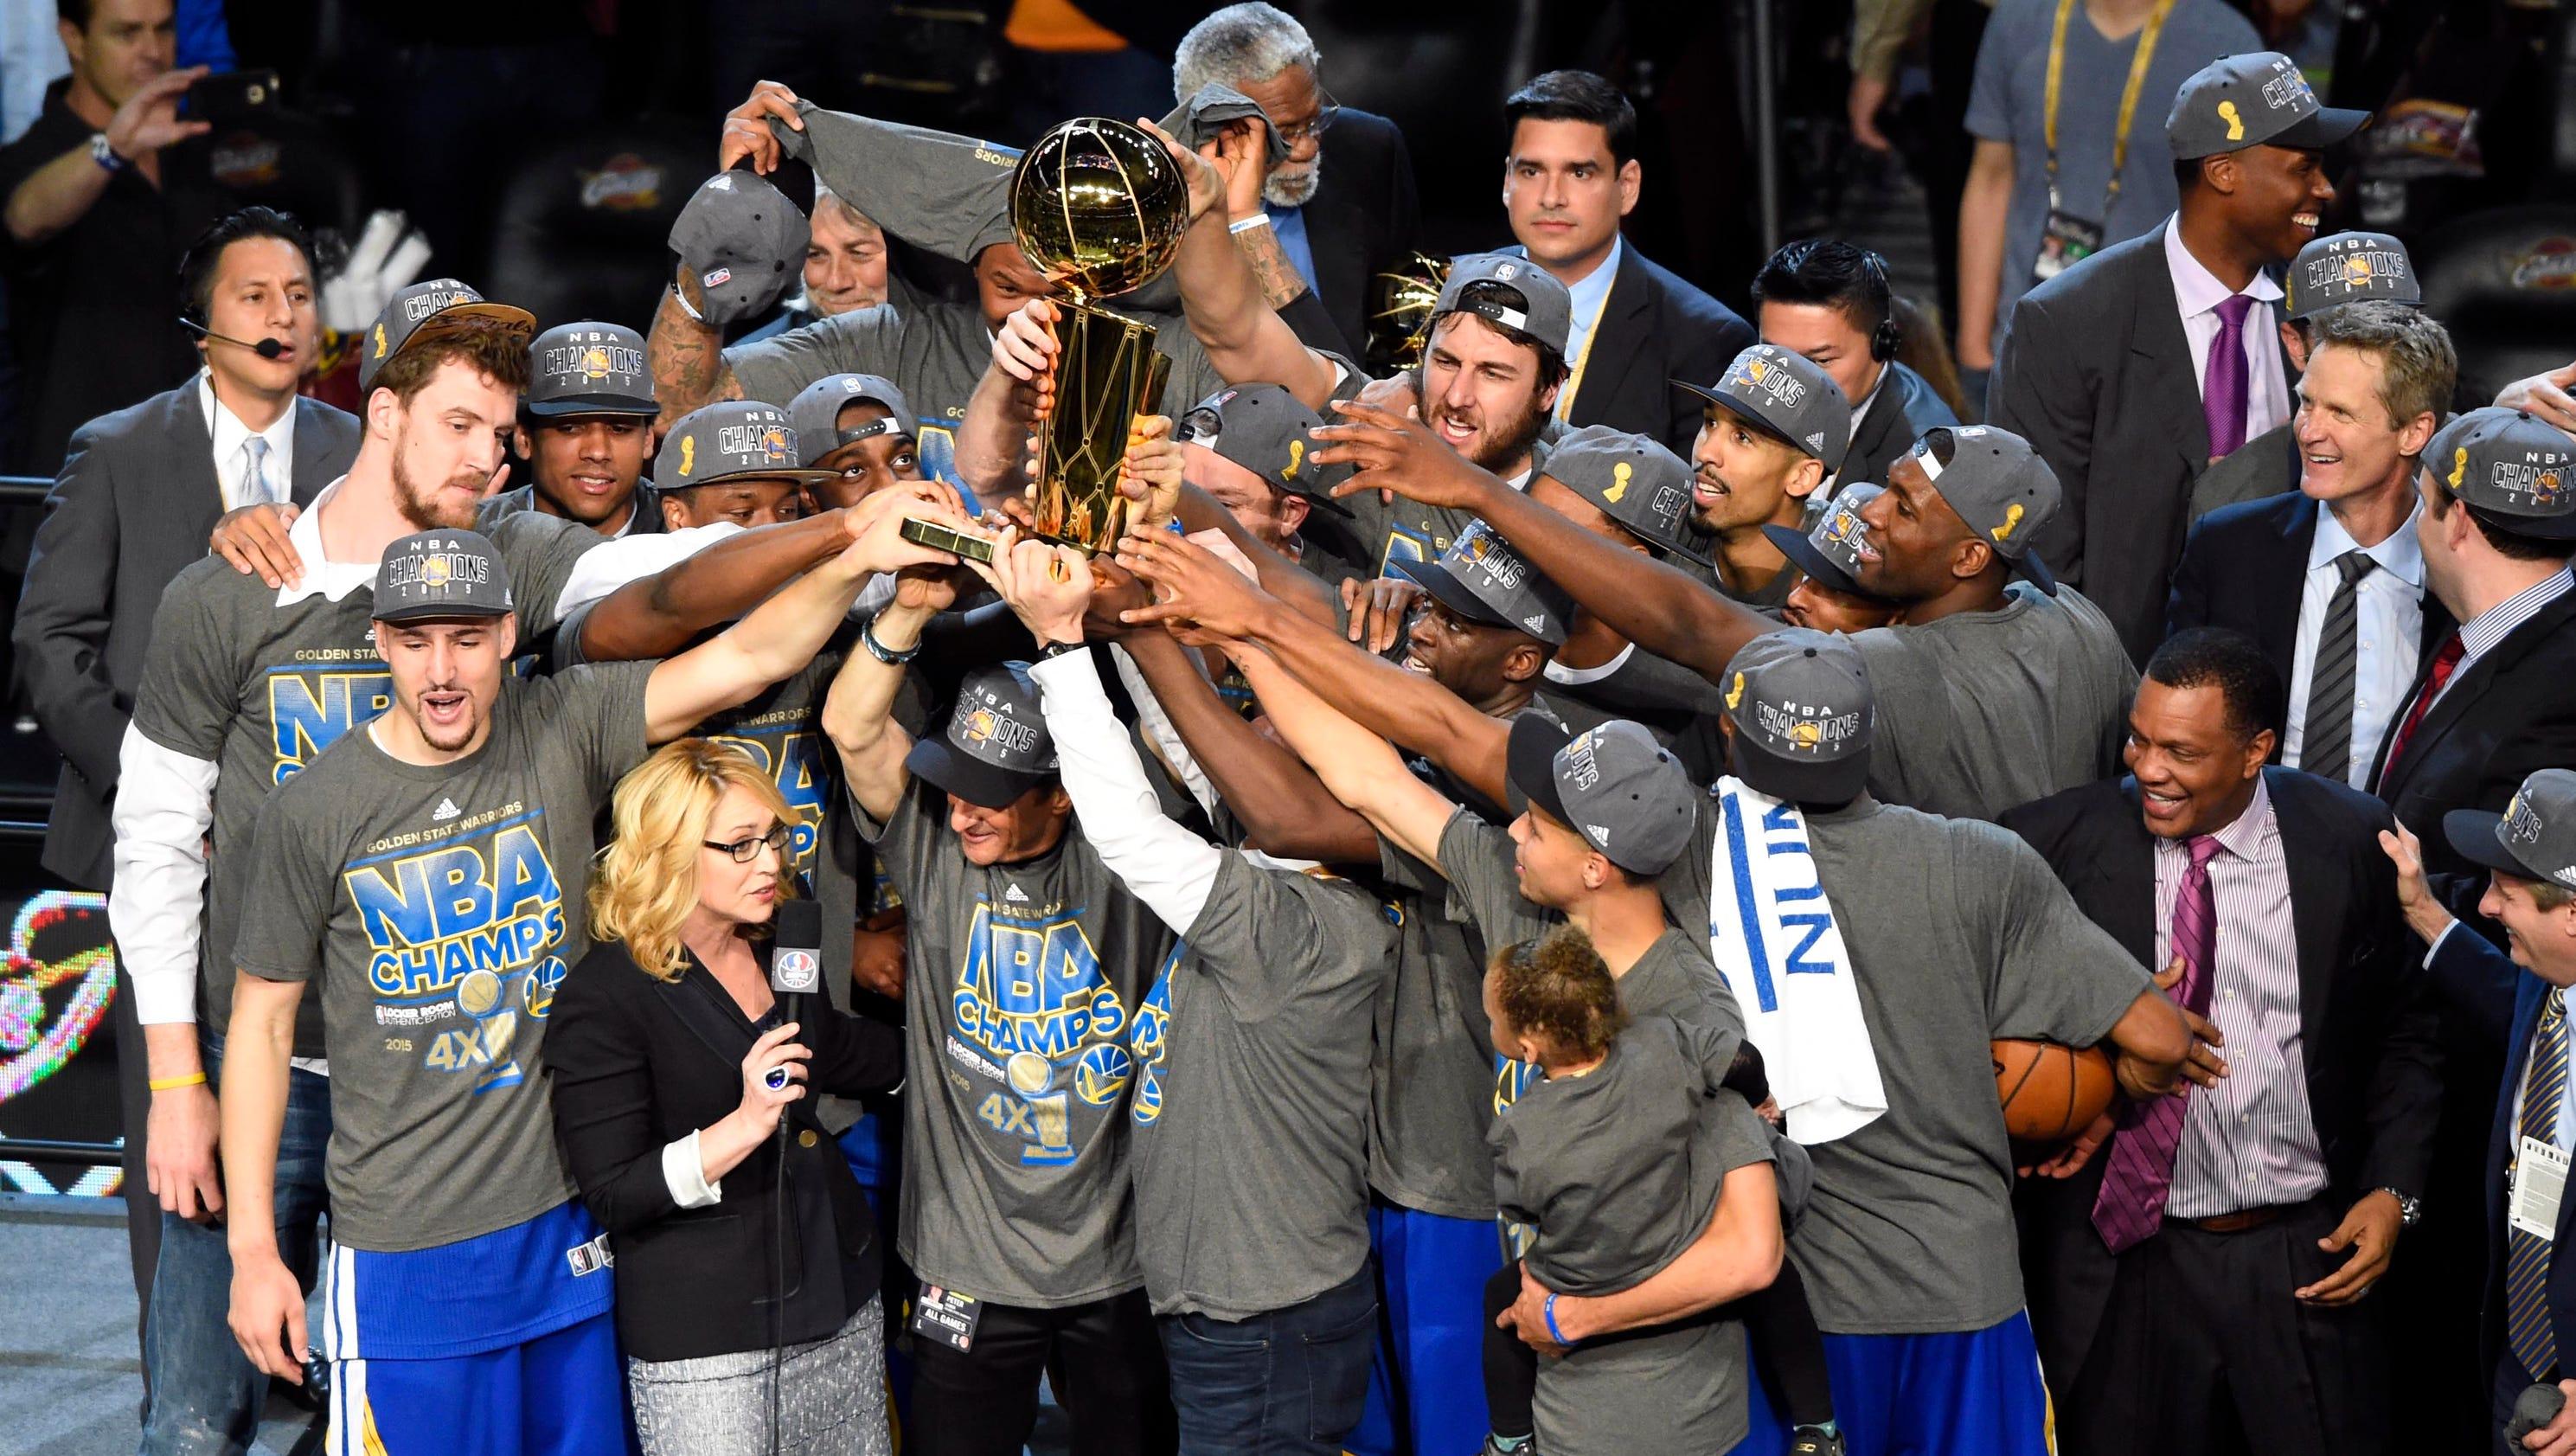 Warriors win NBA title, down LeBron, Cavs 105-97 in Game 6